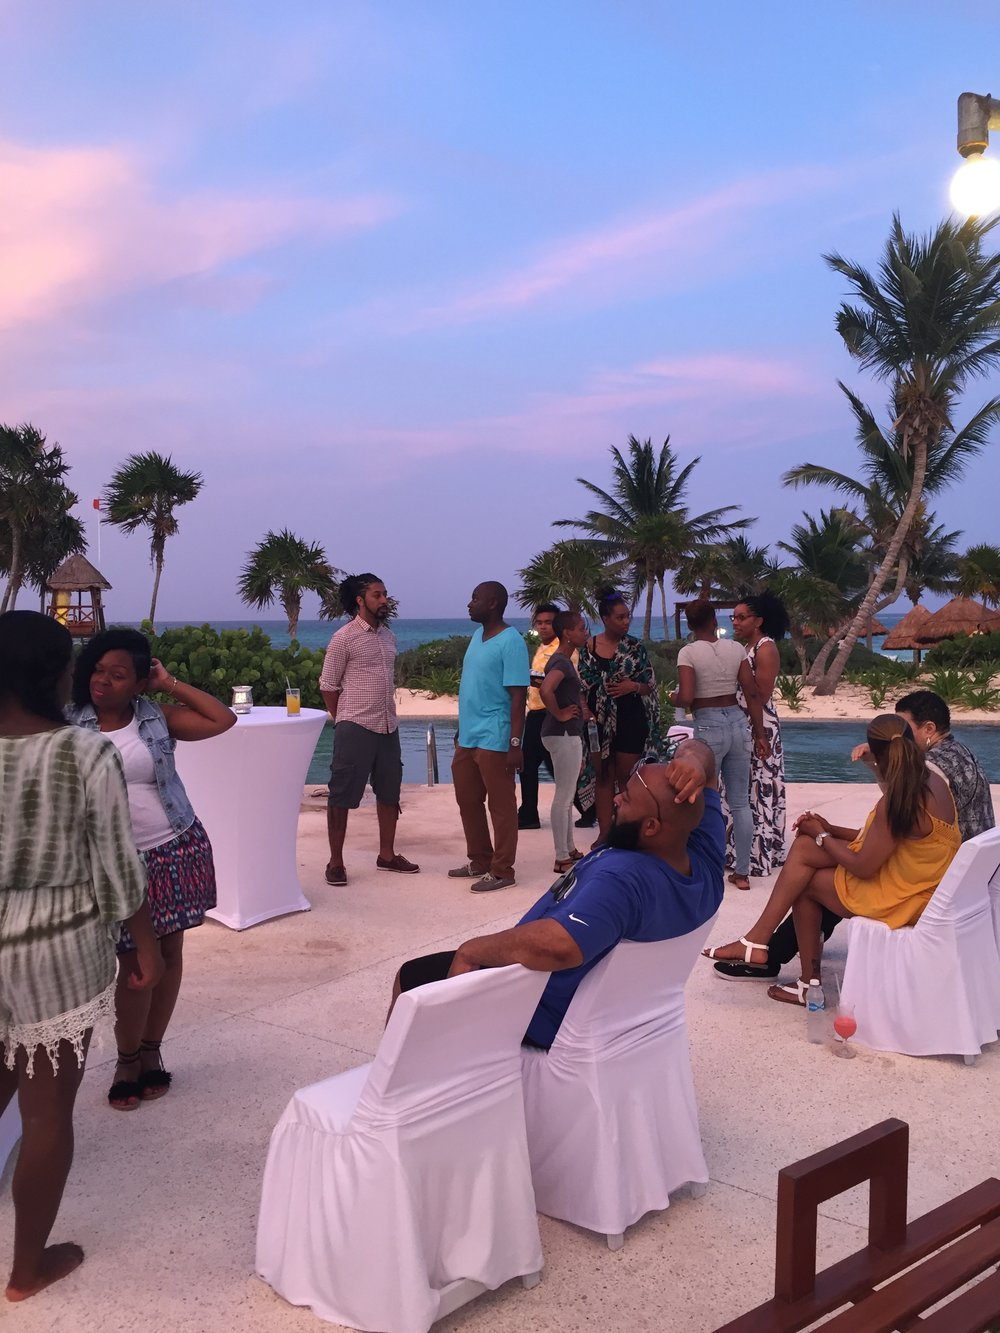 Black Destination Bride - BlackDesti Wedding Countdown Journal - Bridefriends Podcast - 3 Playa del Carmen Mexico - Secrets Maroma Welcome Pool15.JPG